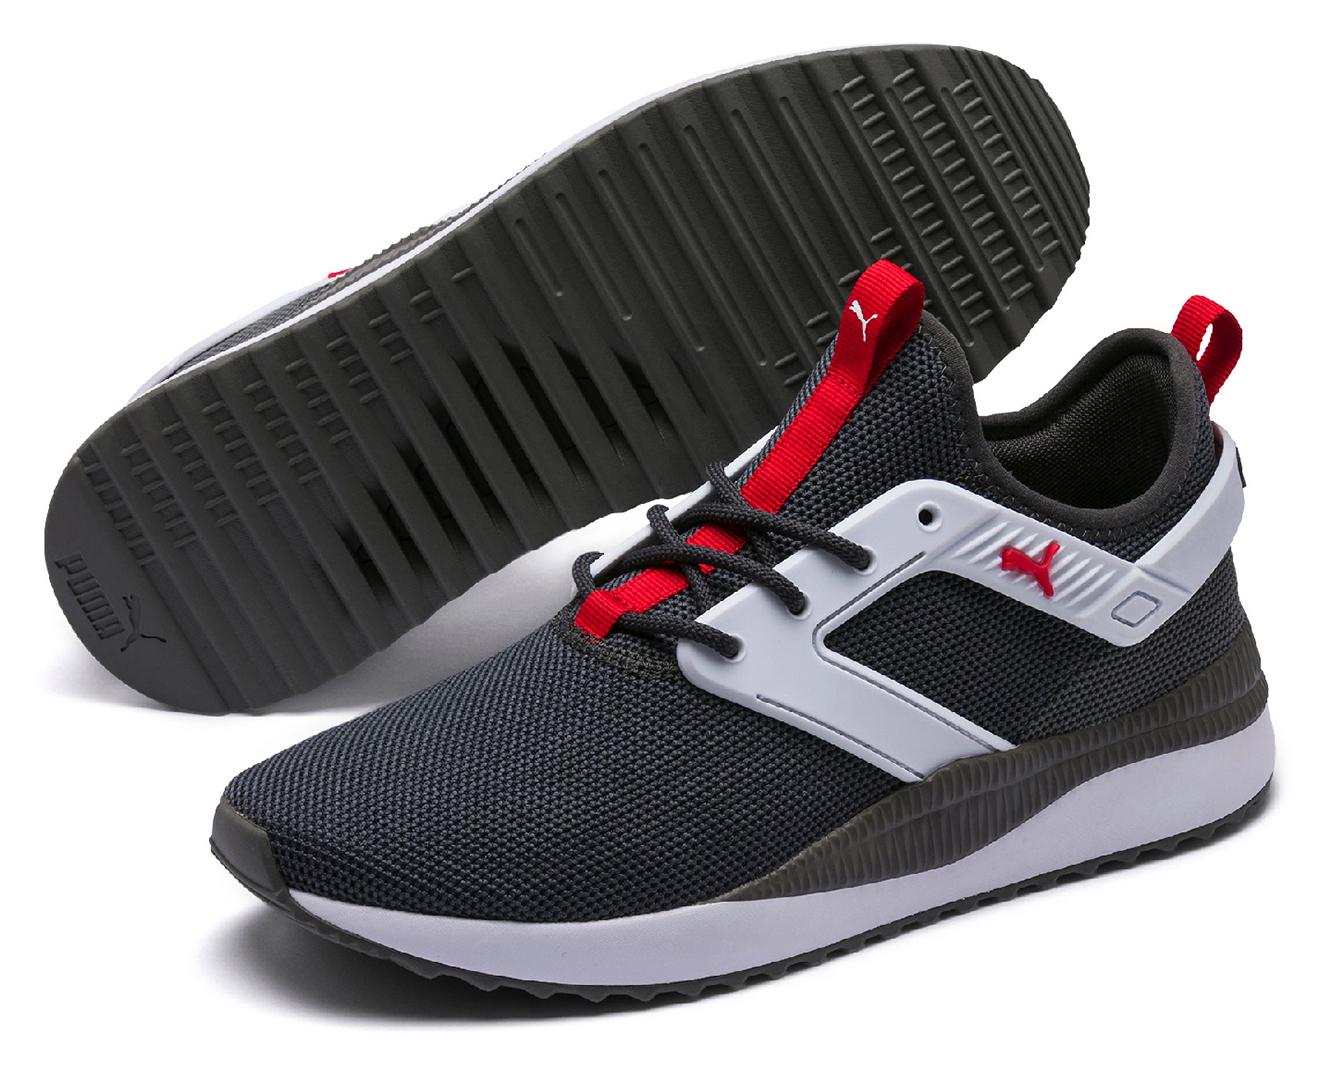 Puma Men's Pacer Next Excel Shoes AsphaltCharcoal Grey